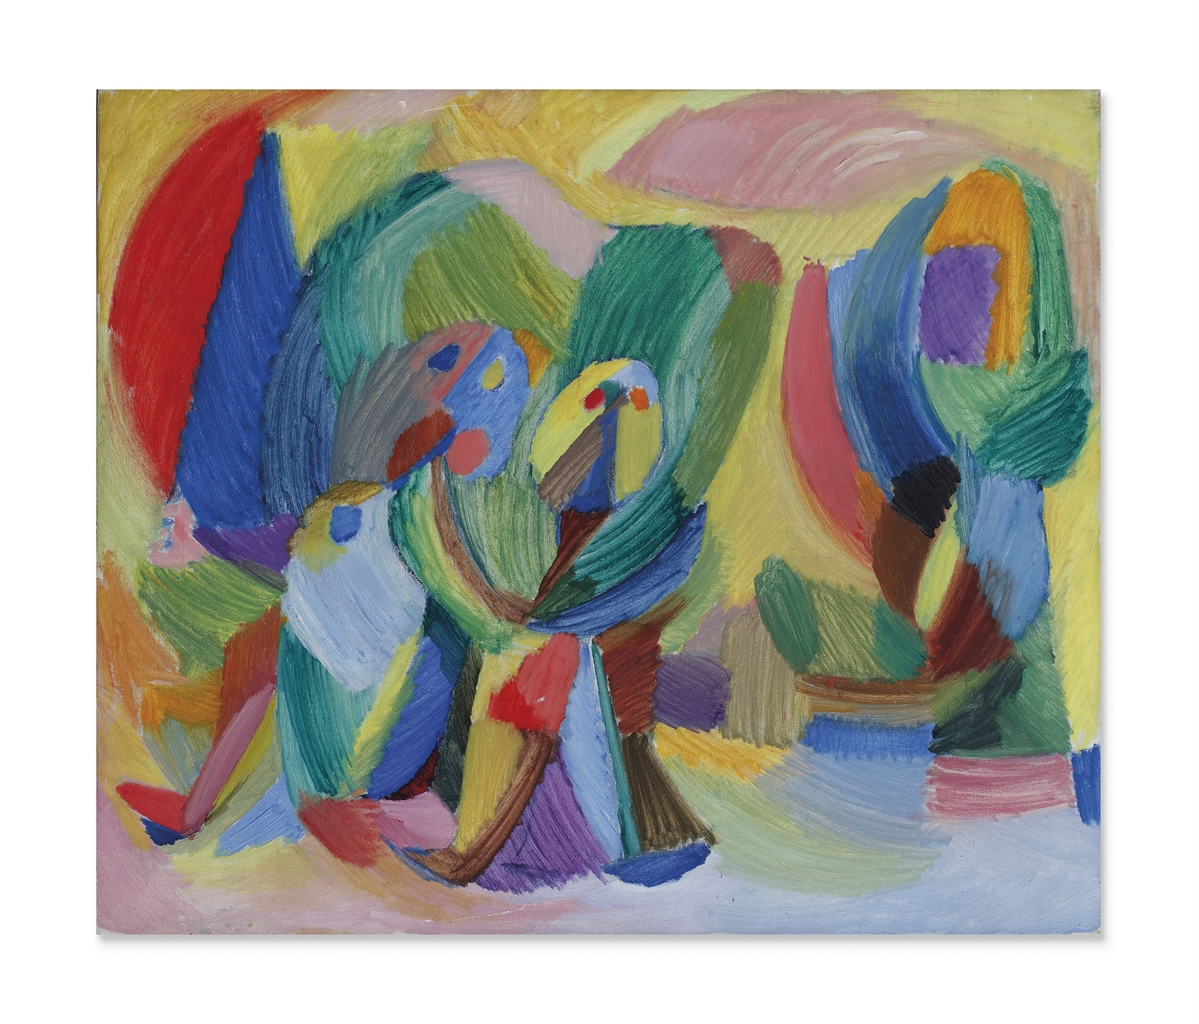 Asger Jorn-Untitled-1943